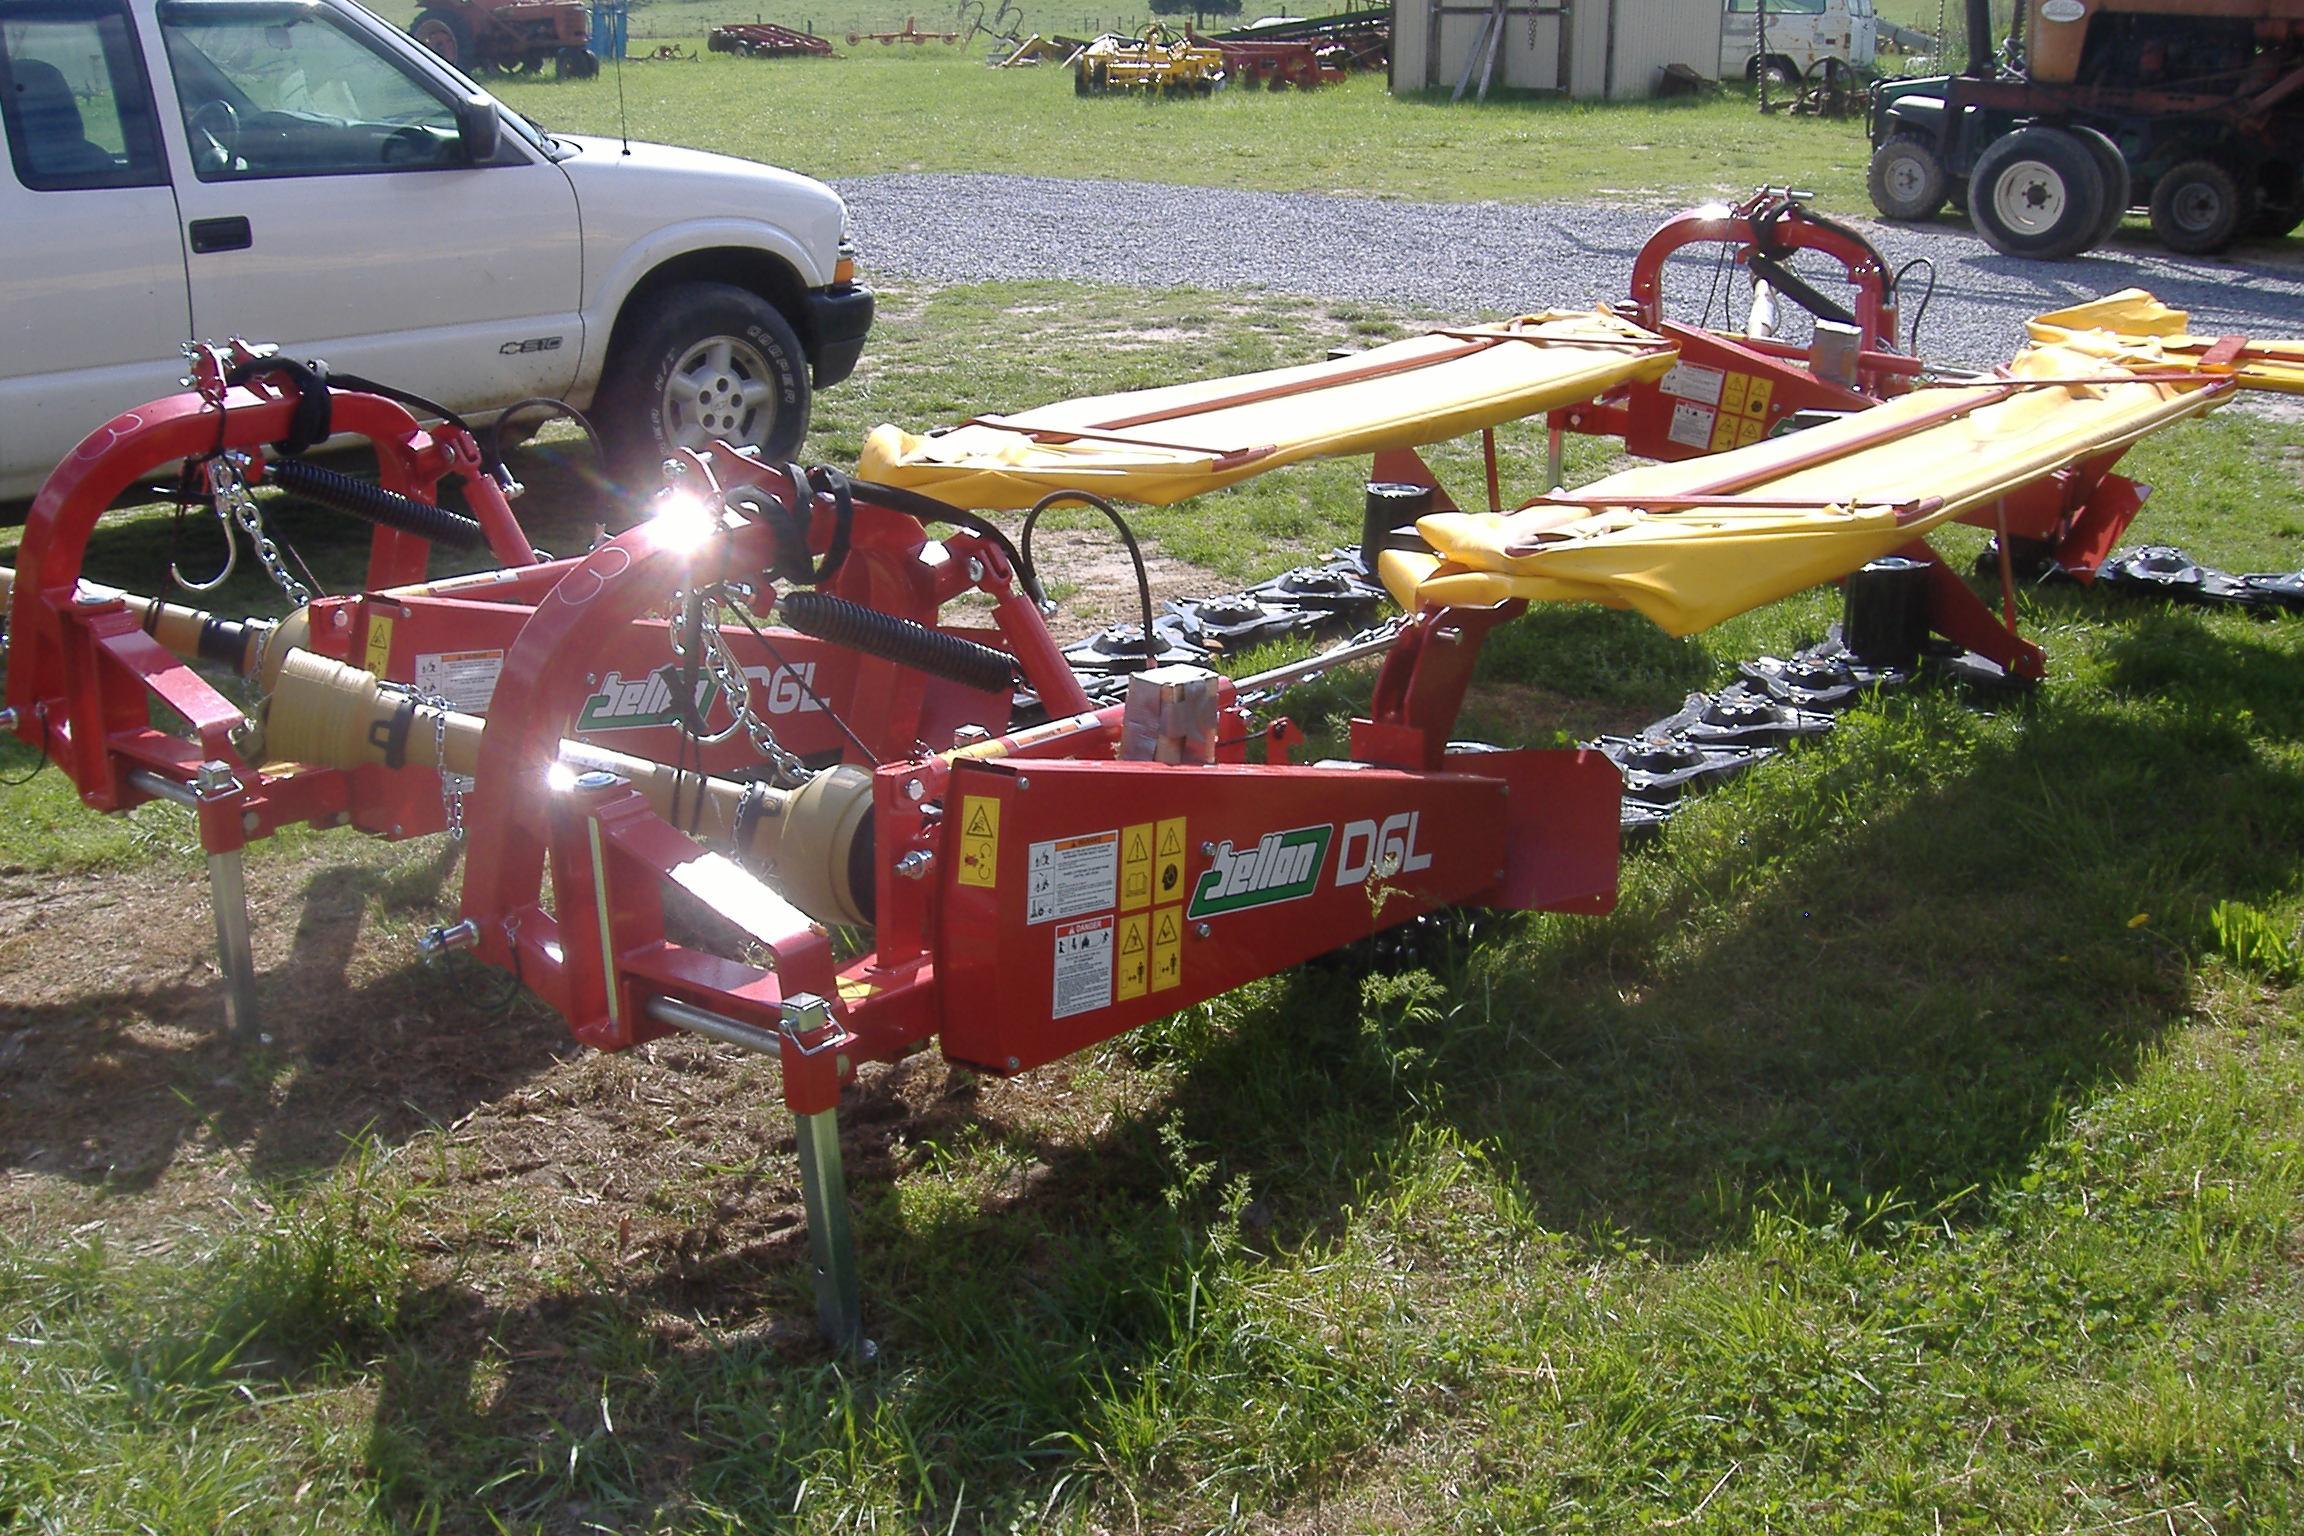 T&W Farm Equipment – SaMASZ Mowers, Branson Tractors